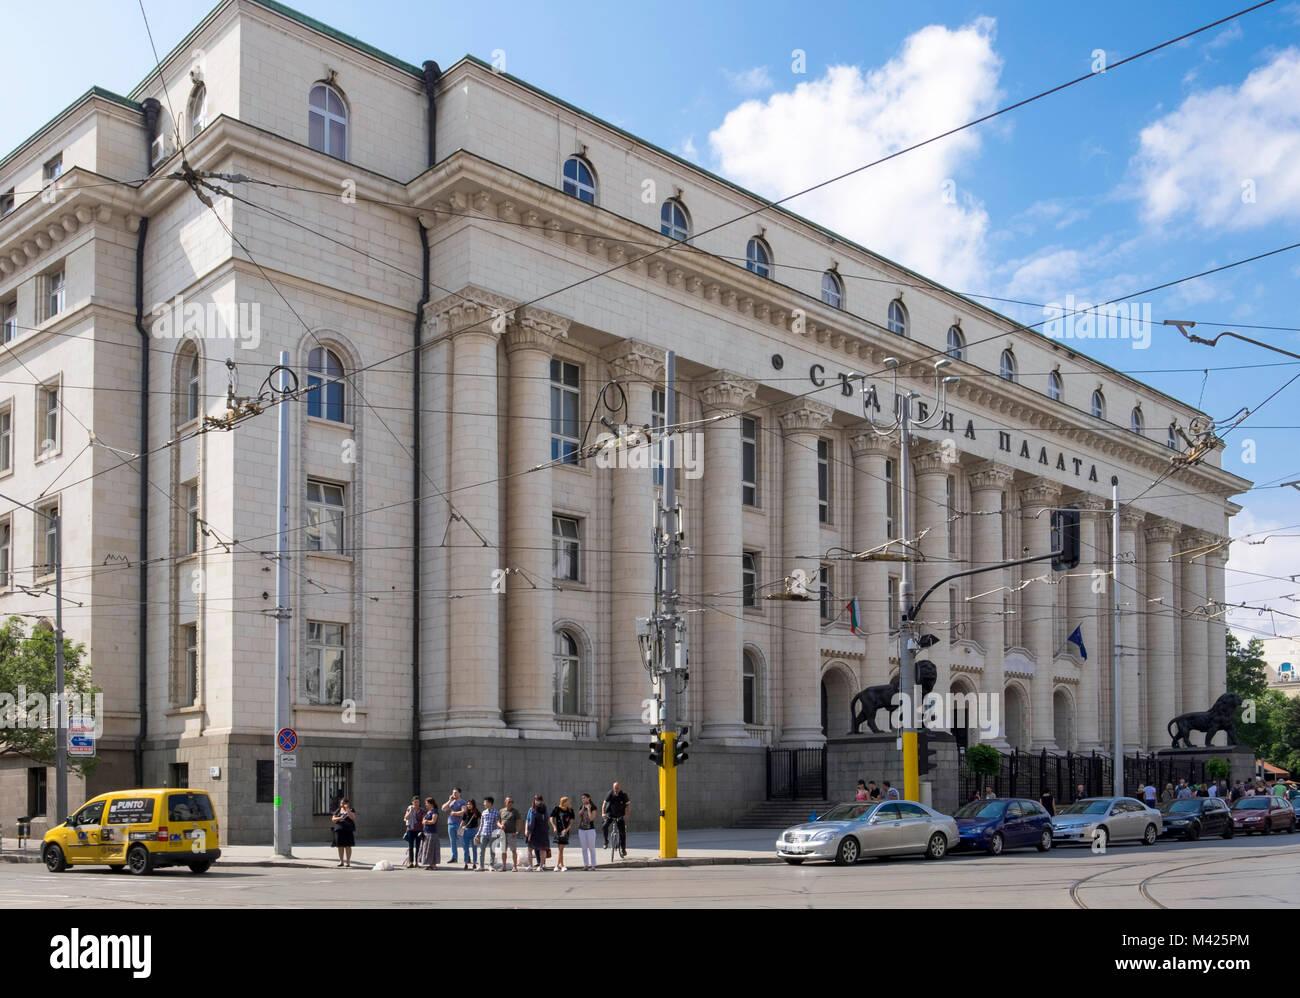 Palace of Justice, (Courts) Vitosha Boulevard, central Sofia, Bulgaria, Europe - Stock Image